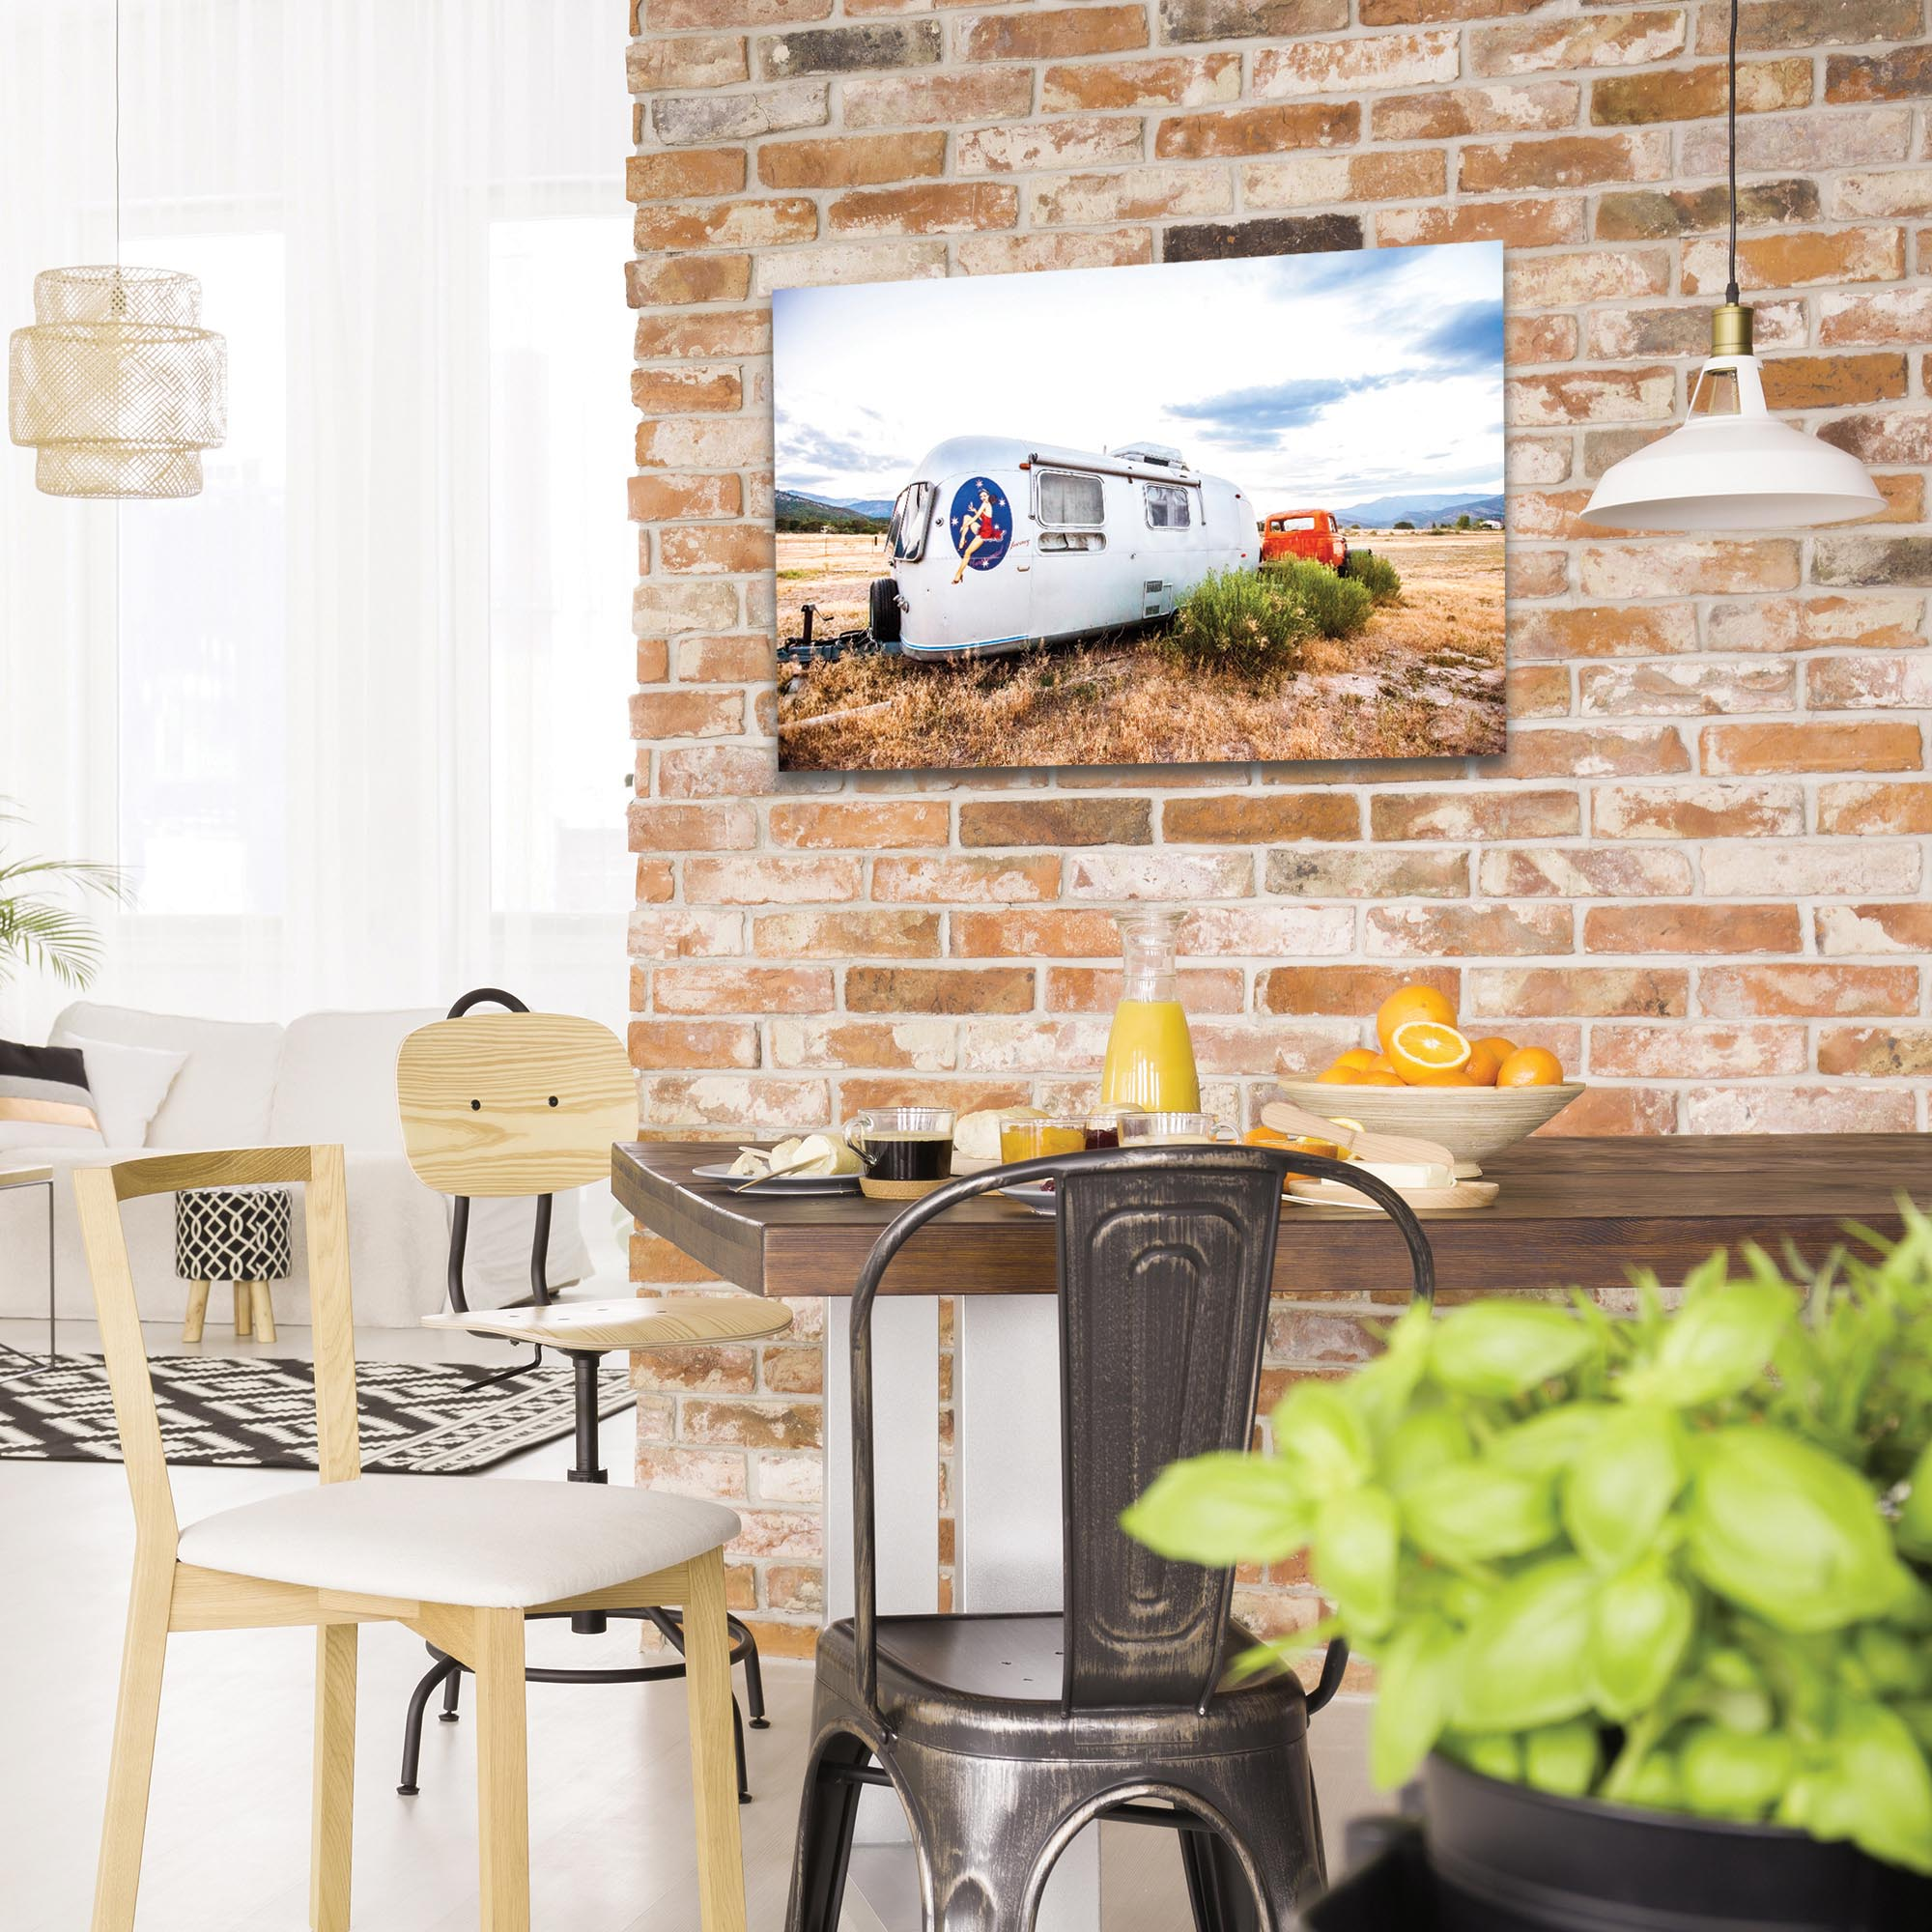 Americana Wall Art 'Airstream Lady' - Classic Cars Decor on Metal or Plexiglass - Lifestyle View